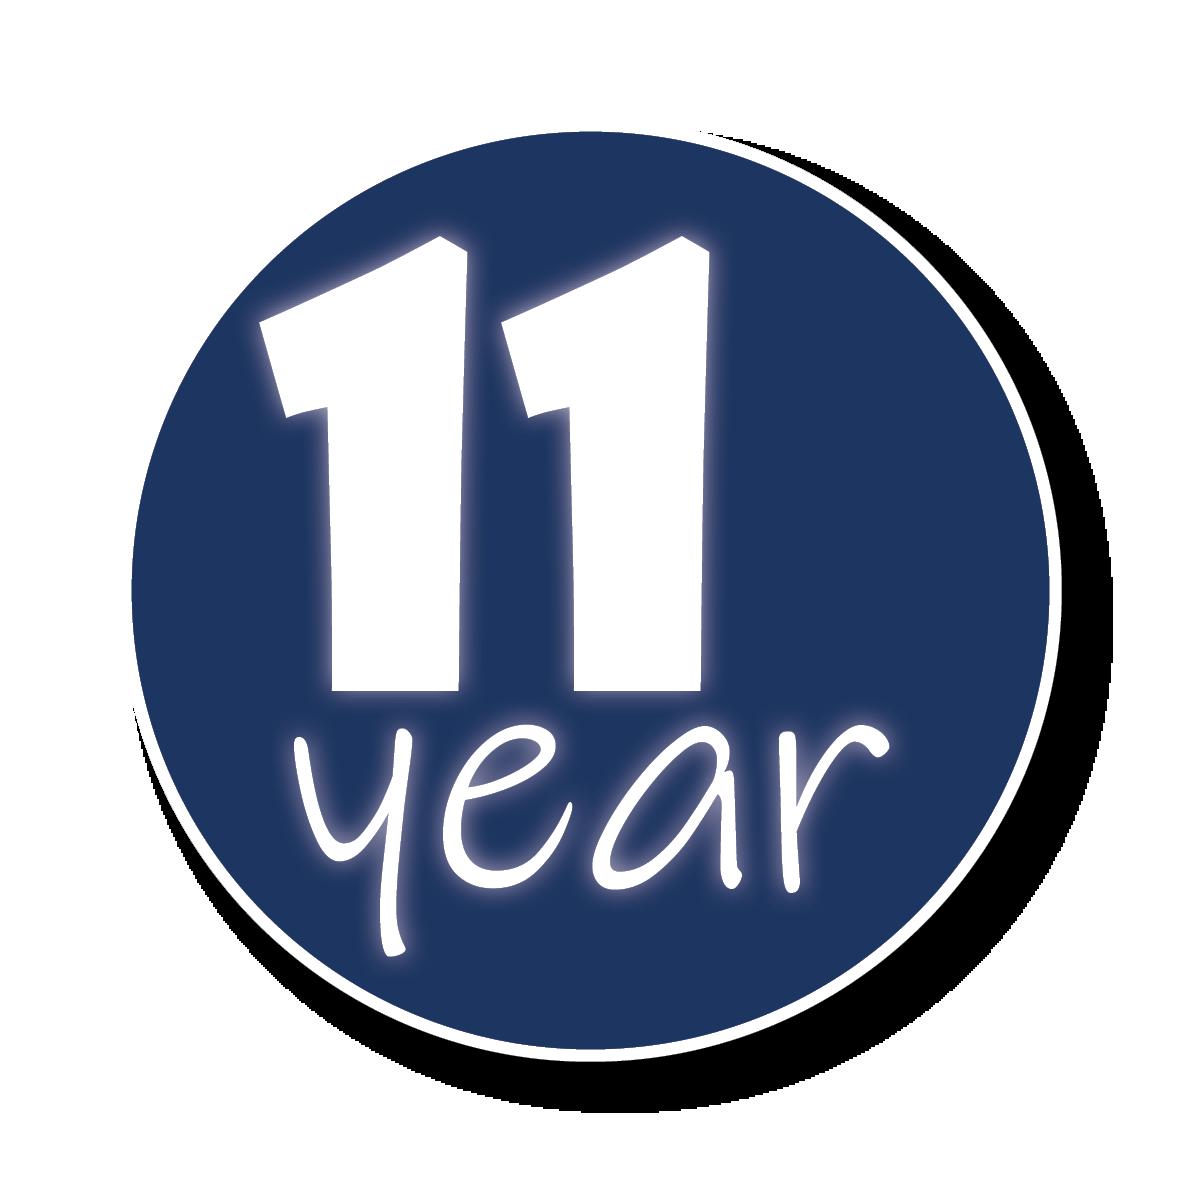 11 Year Guarantee from Caddy Windows